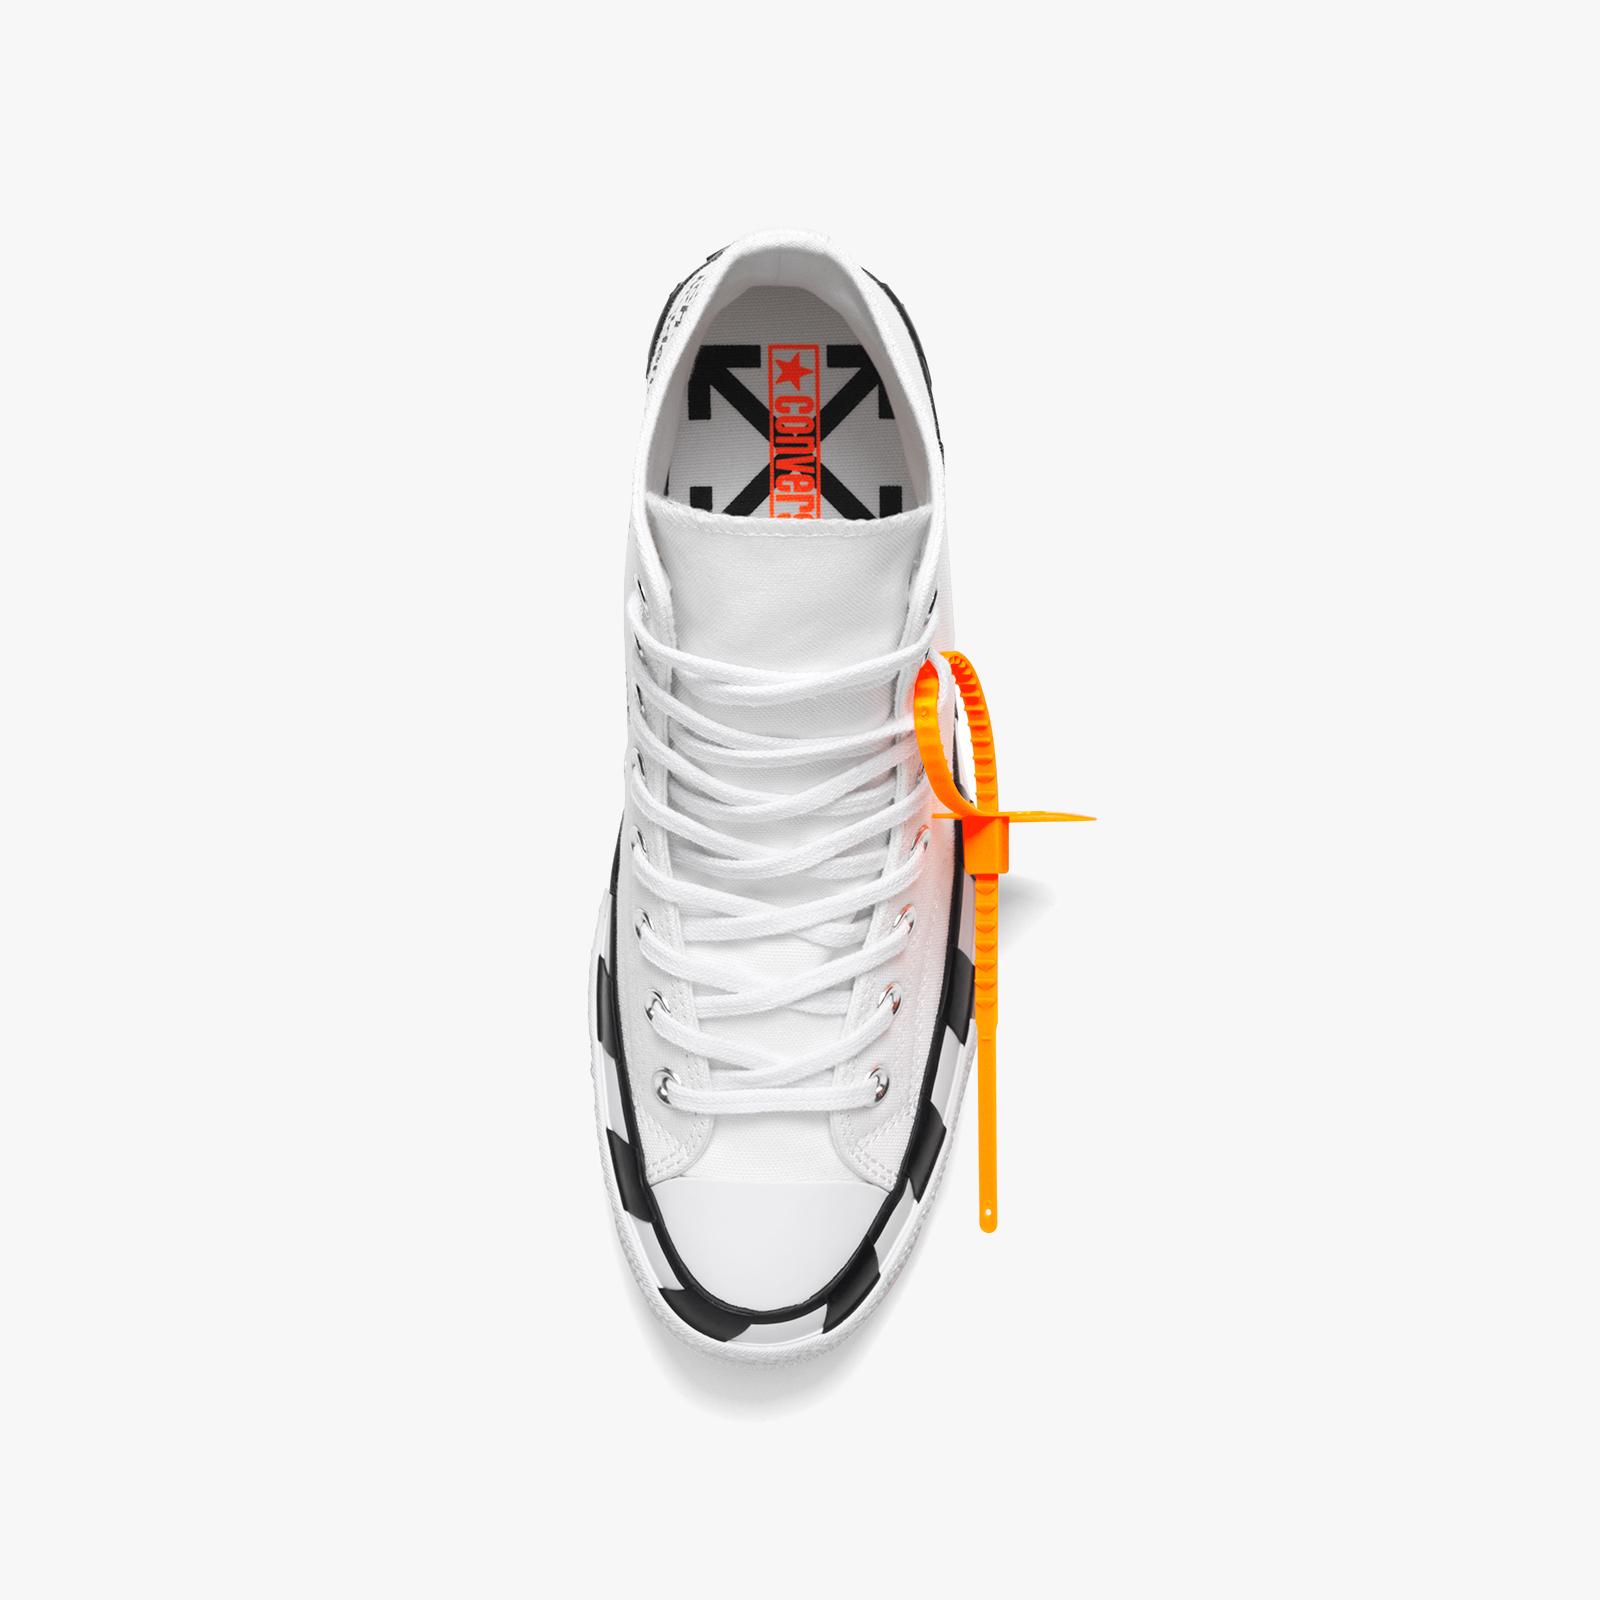 1cb9523fbdbc Converse Chuck Taylor 70 x Off White - 163862c - Sneakersnstuff ...